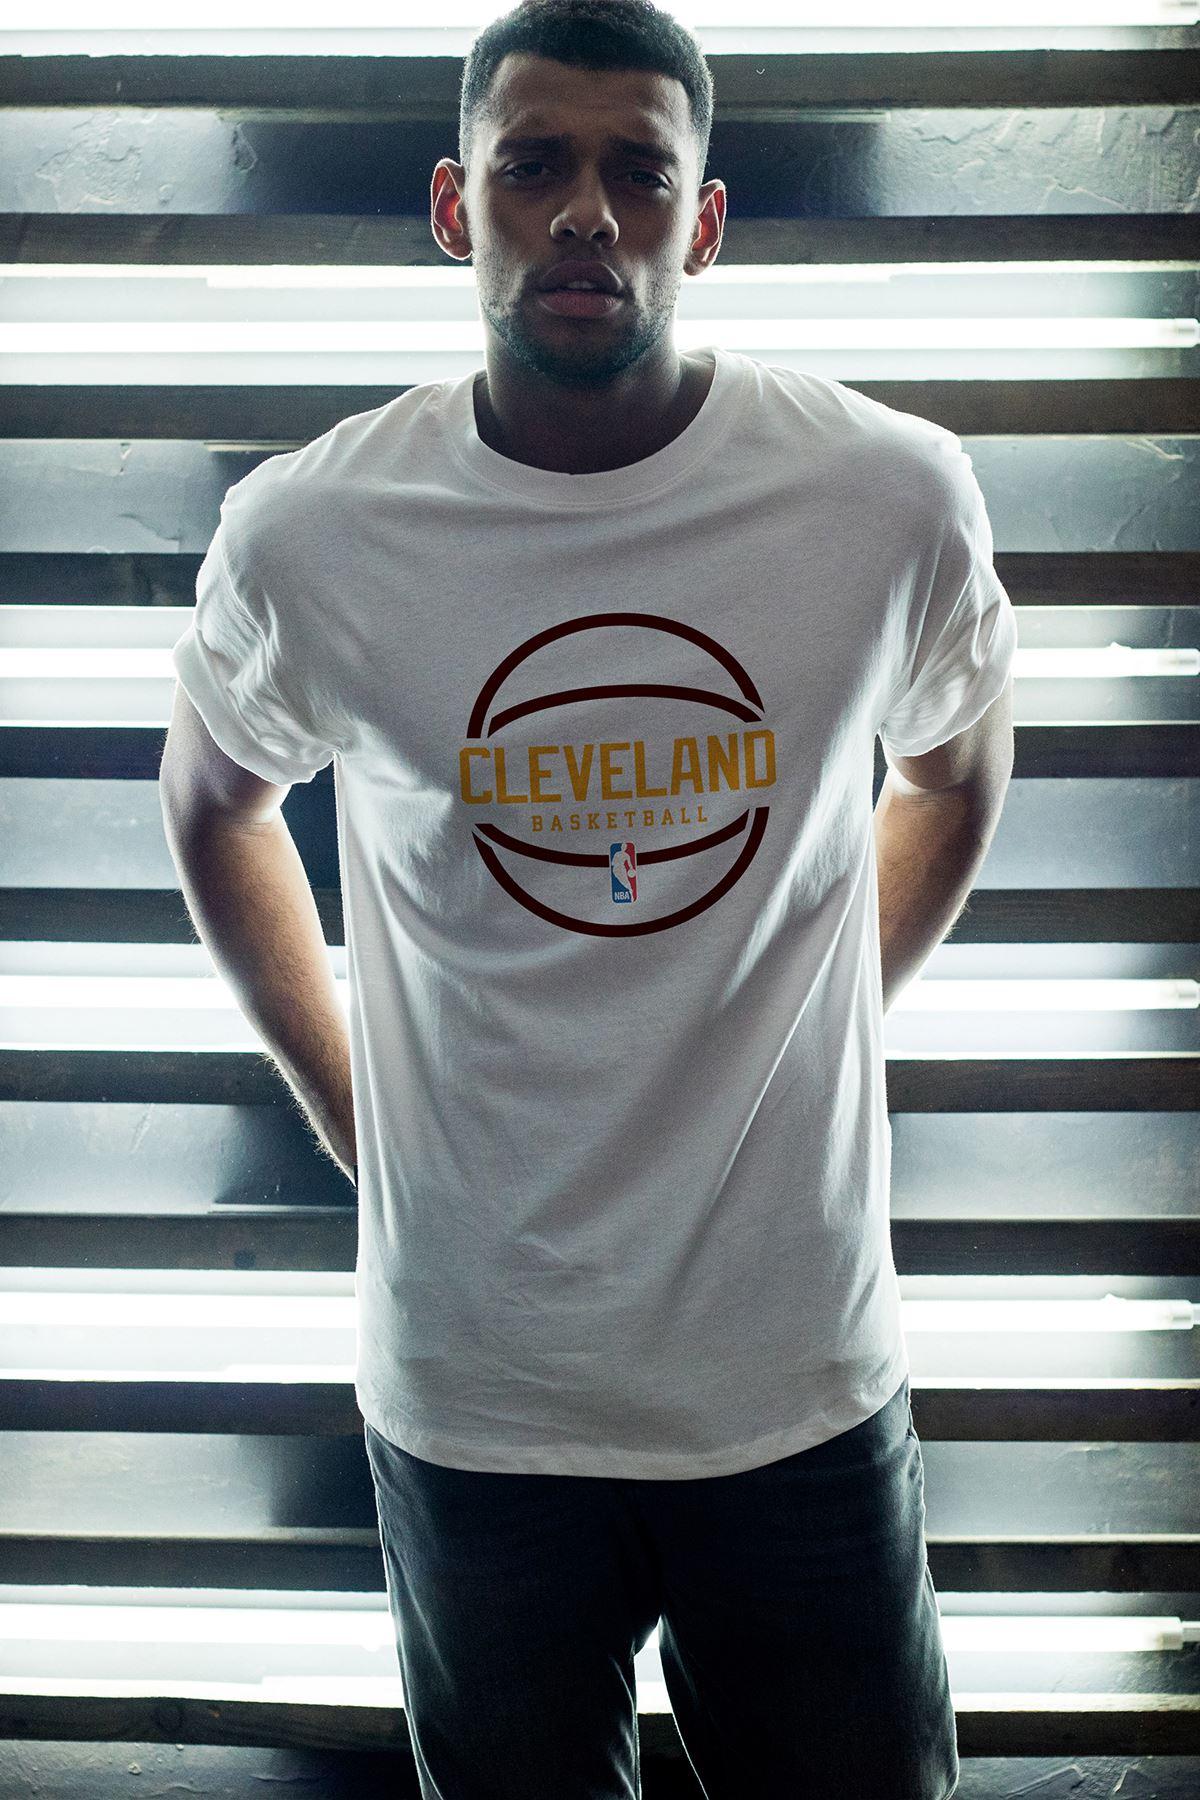 Cleveland 03 Beyaz Erkek Oversize Tshirt - Tişört